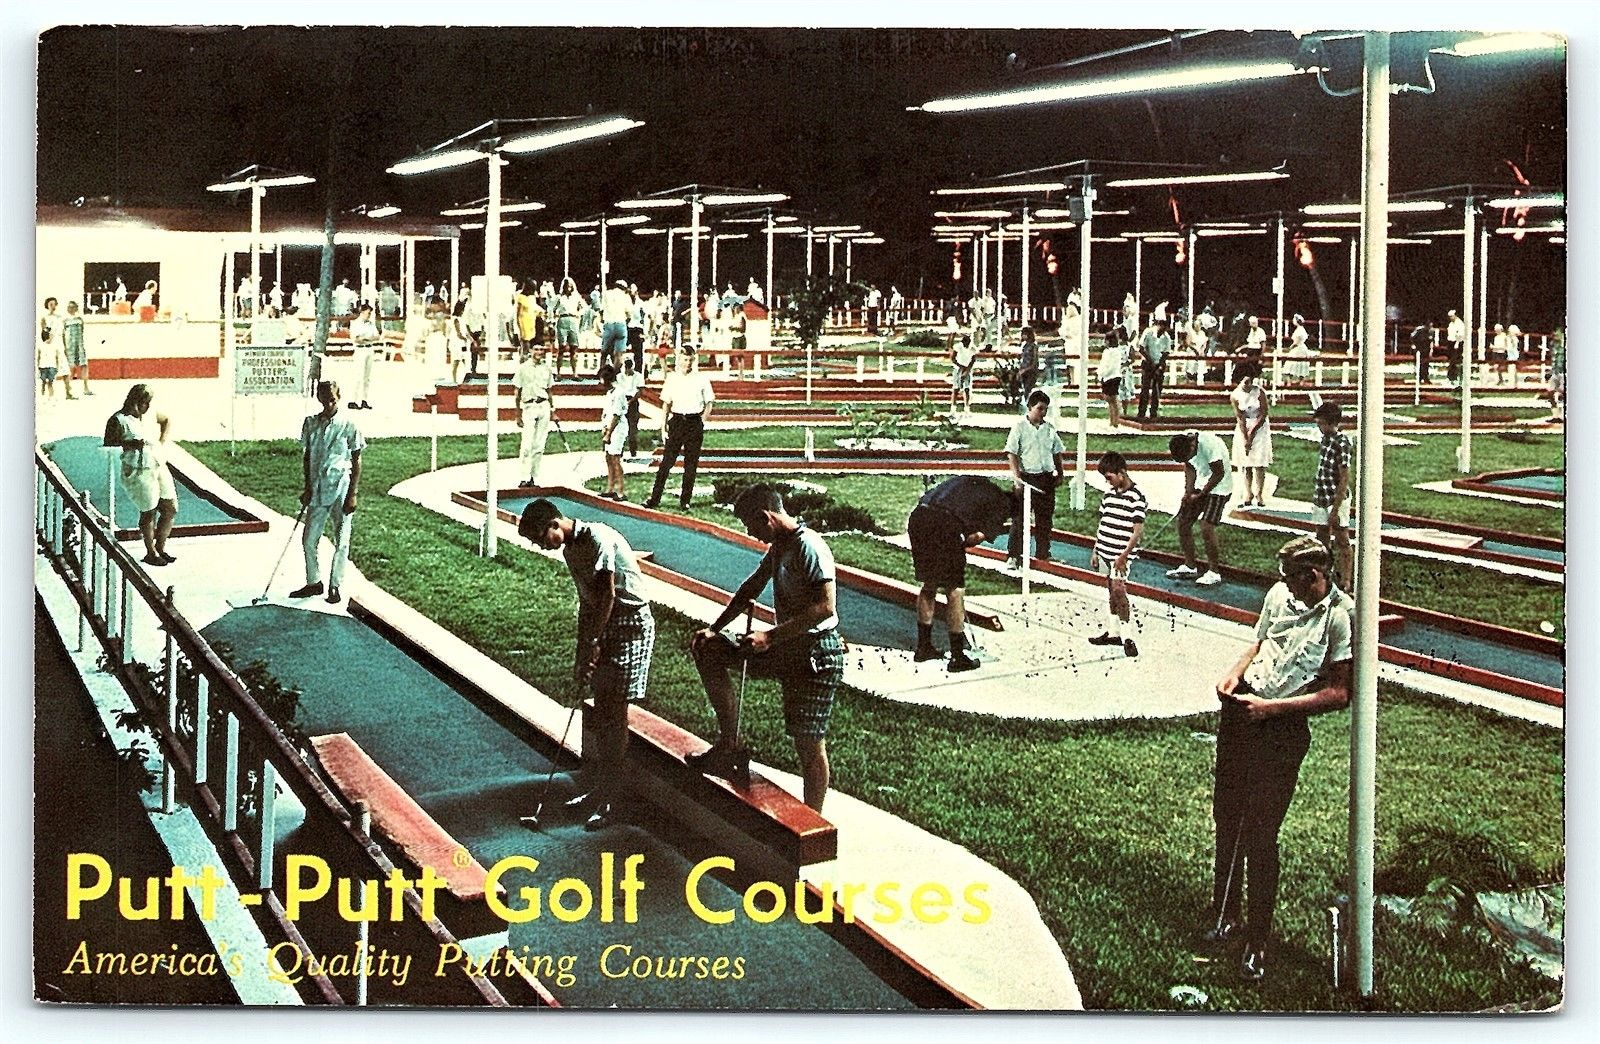 Postcard NM Albuquerque Putt Putt Miniature Golf Courses Ad